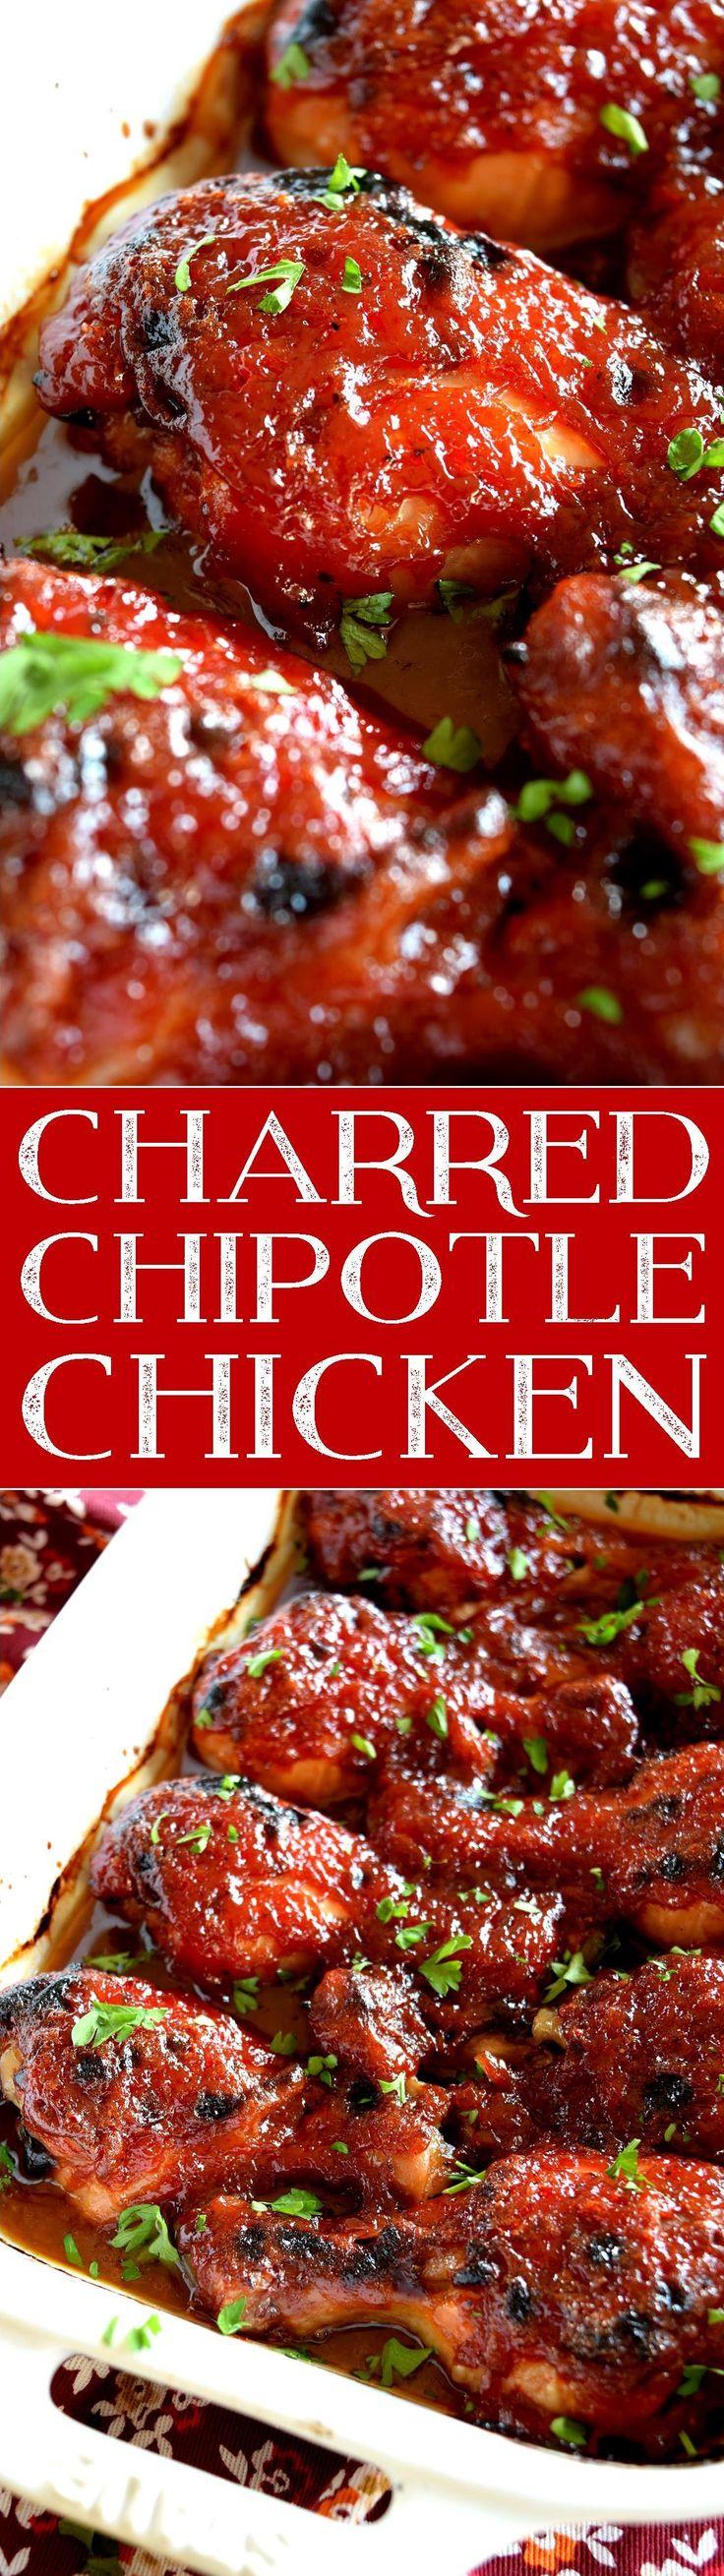 Charred Chipotle Chicken